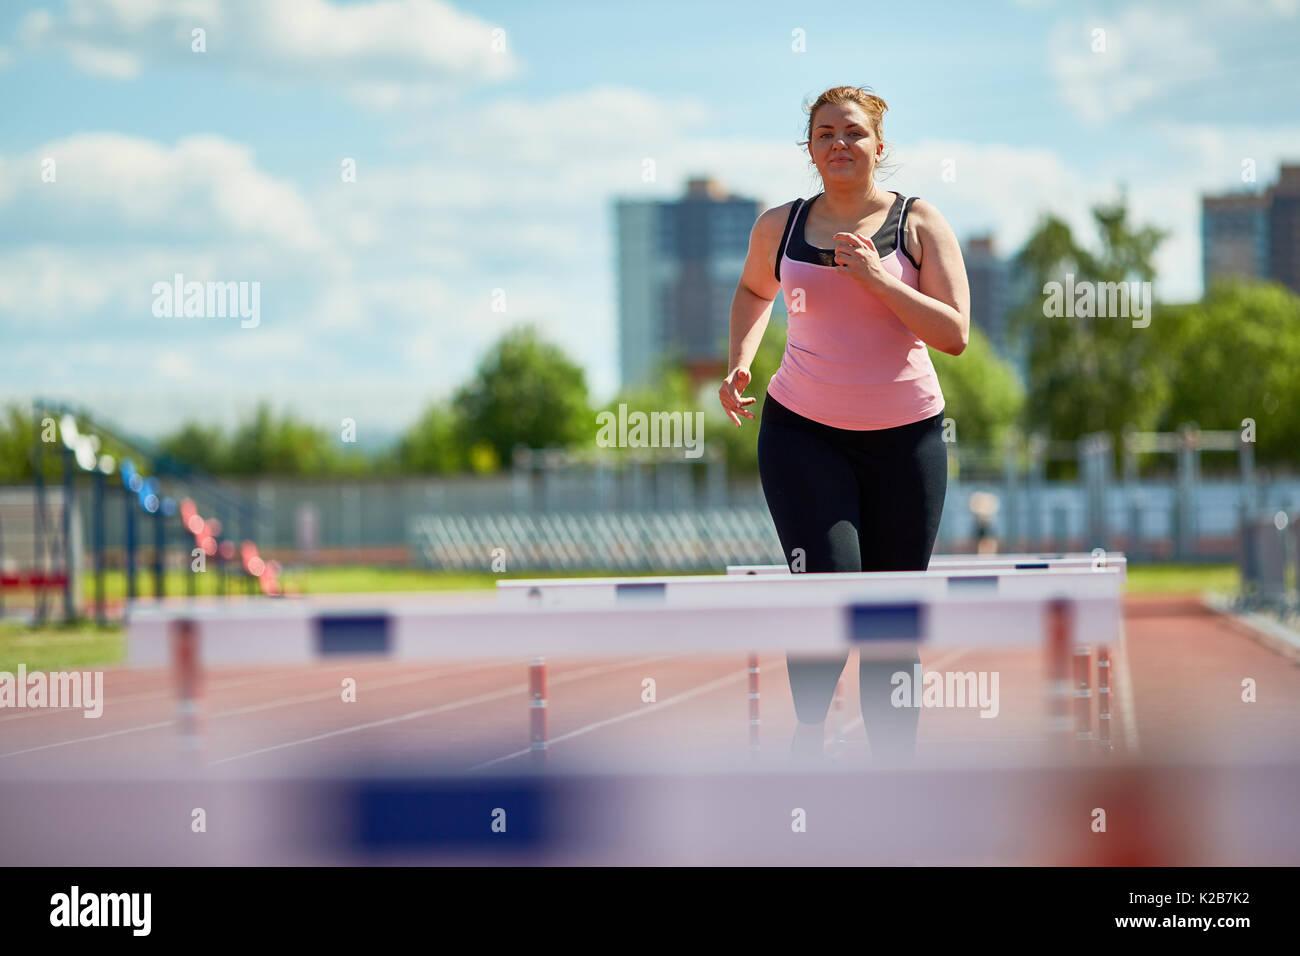 Hurdle running - Stock Image